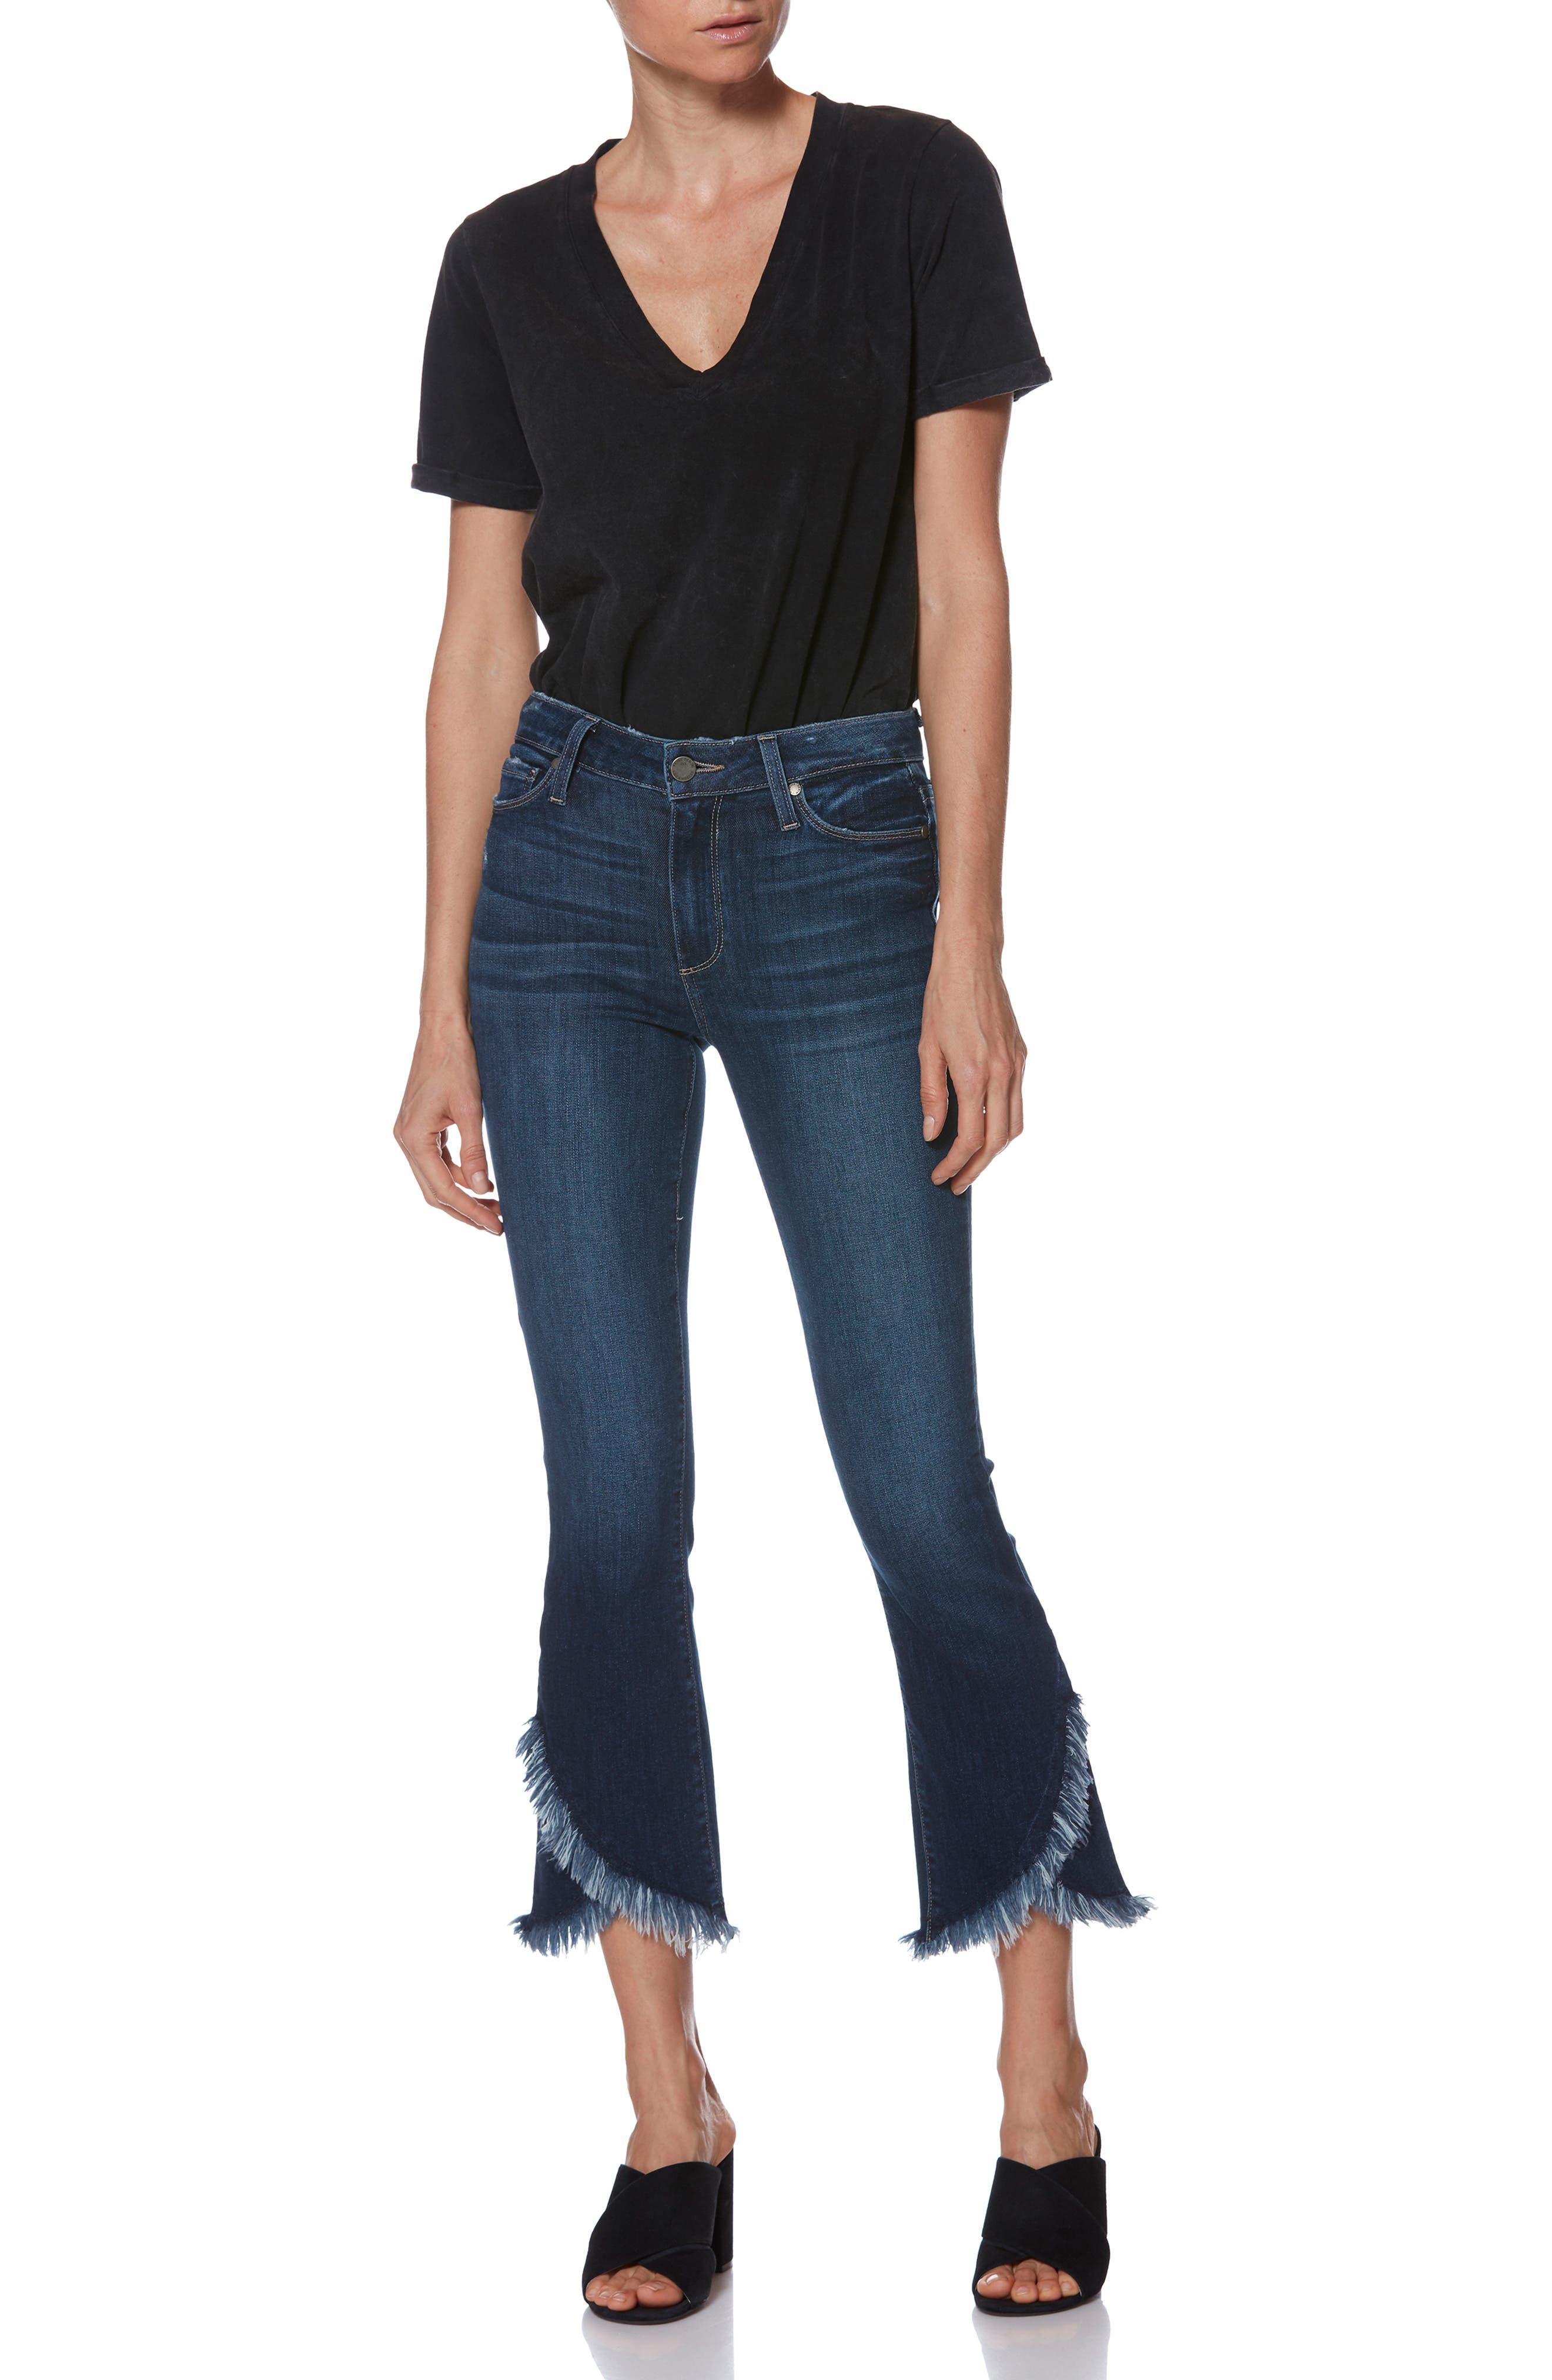 PAIGE,                             Transcend Vintage - Colette Frayed Crop Flare Jeans,                             Alternate thumbnail 7, color,                             PALMA